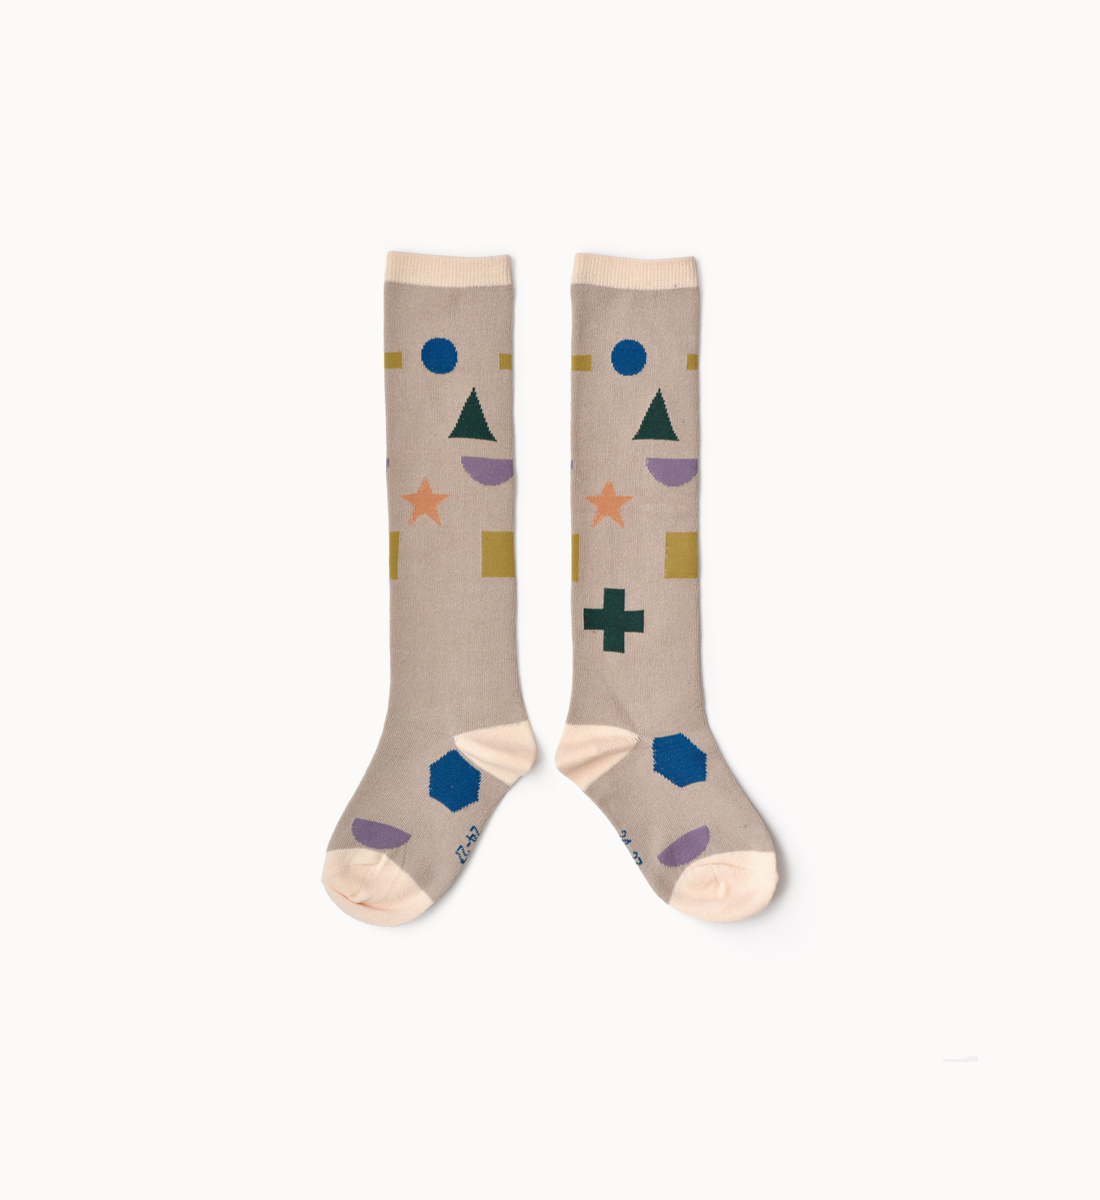 BOXBO 法國時尚雨靴 / 高筒襪-符號